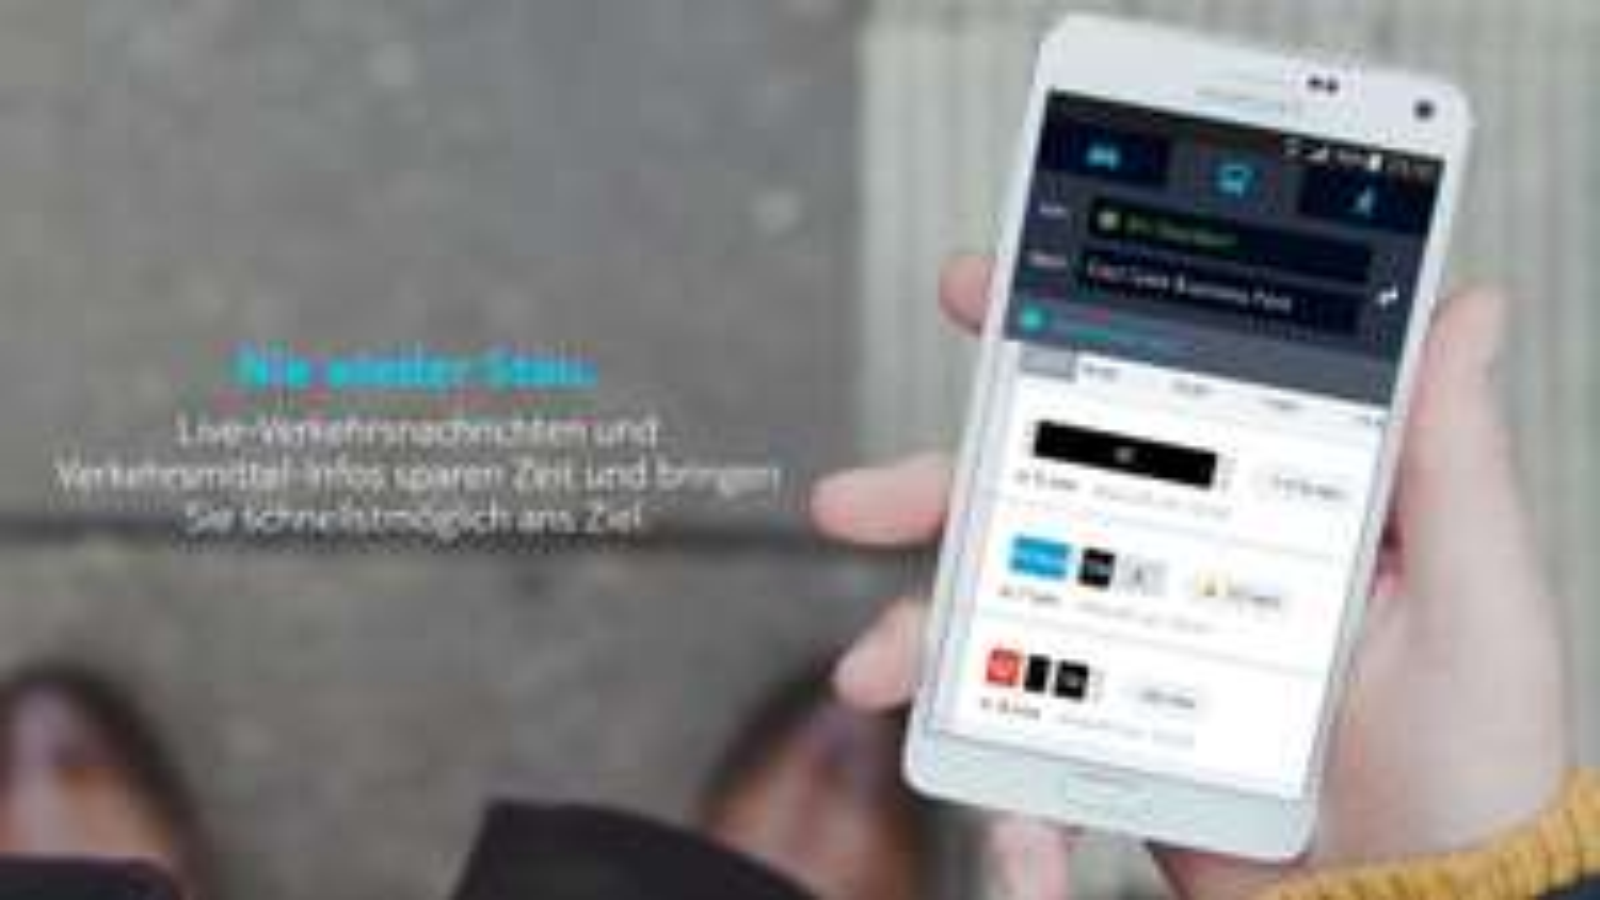 Nokia Here Maps beta ((offline) maps / navigatie) gratis @ Google Play